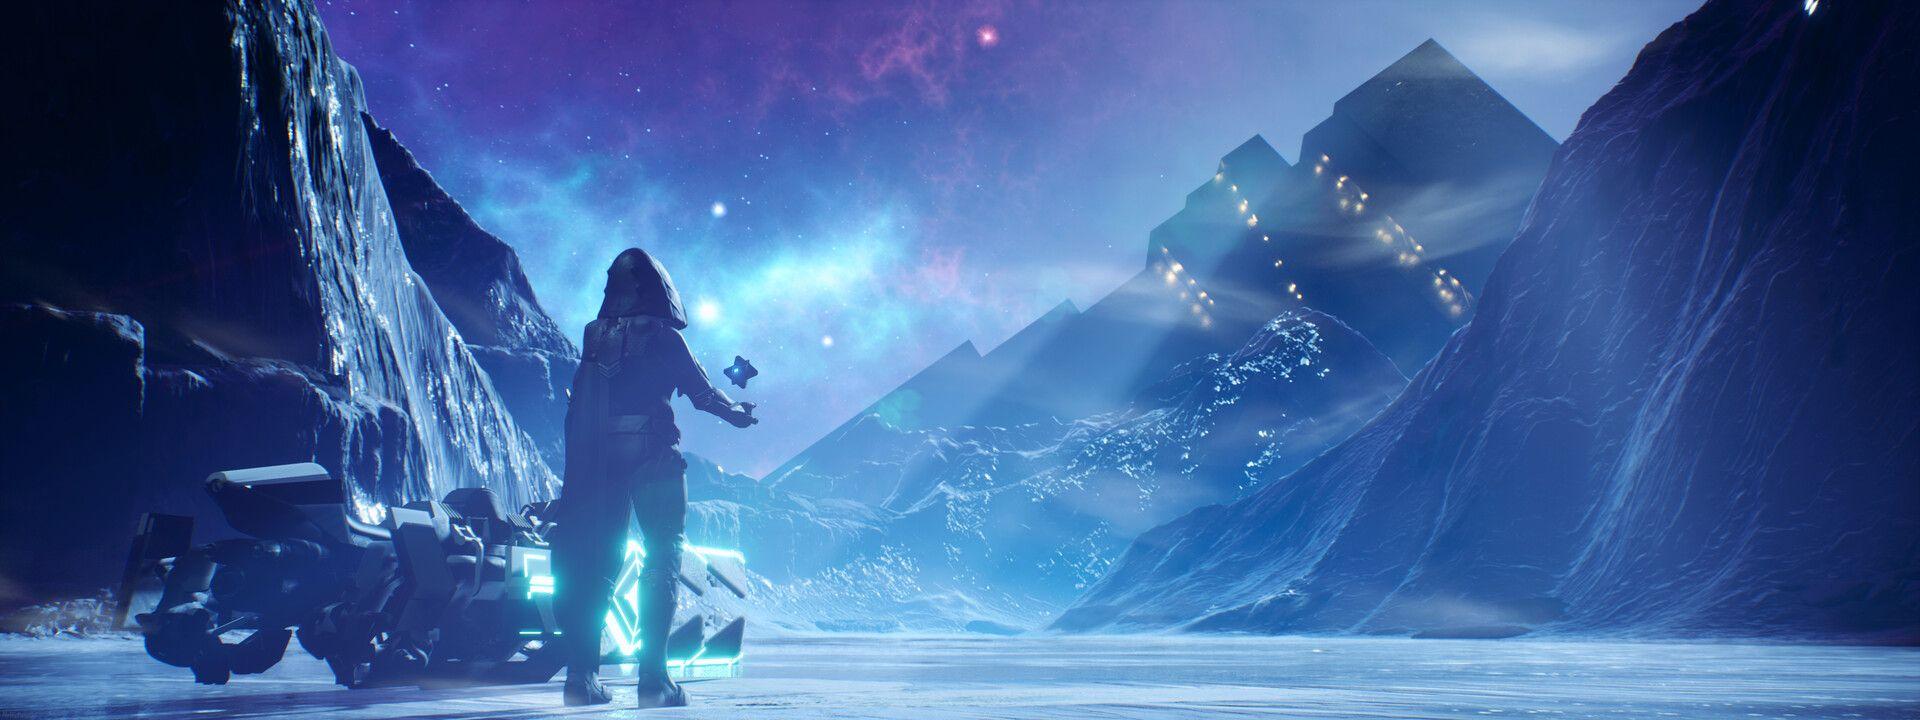 Artstation Beyond Light Destiny 2 Fanart John C Destiny Game Destiny 2 Fanart Destiny 2 Beyond Light